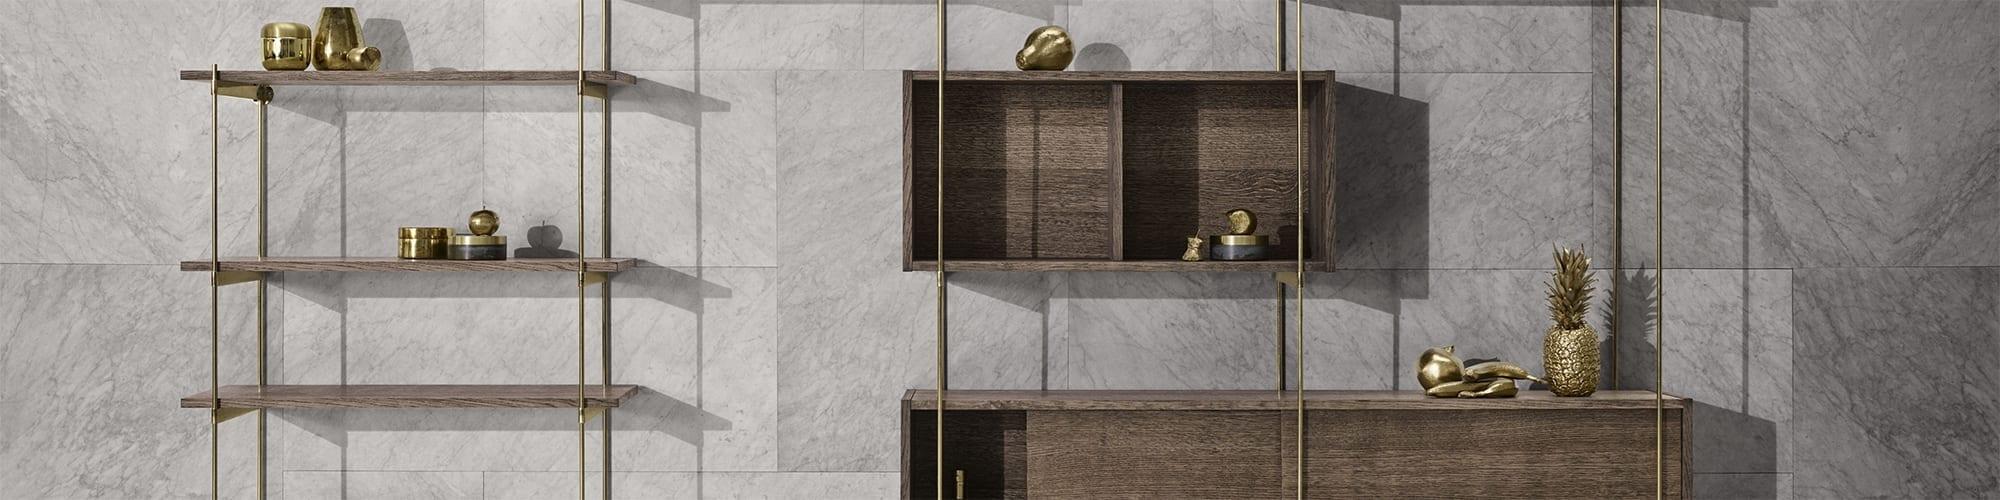 Shelf & Cabinet